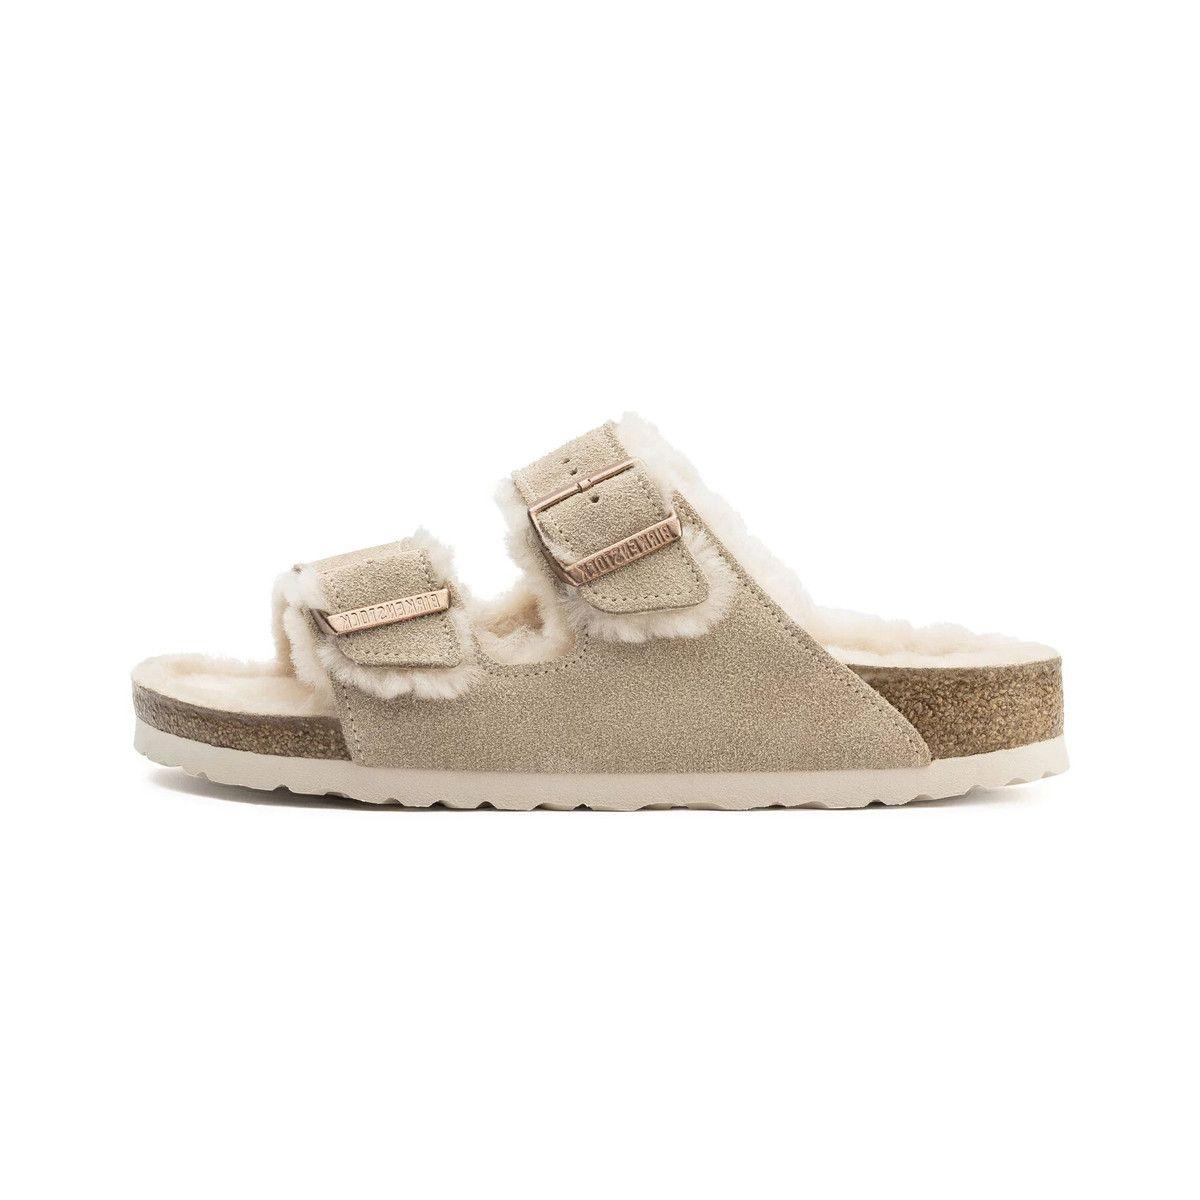 Sandale Birkenstock ARIZONA FUR MINK Pegashoes